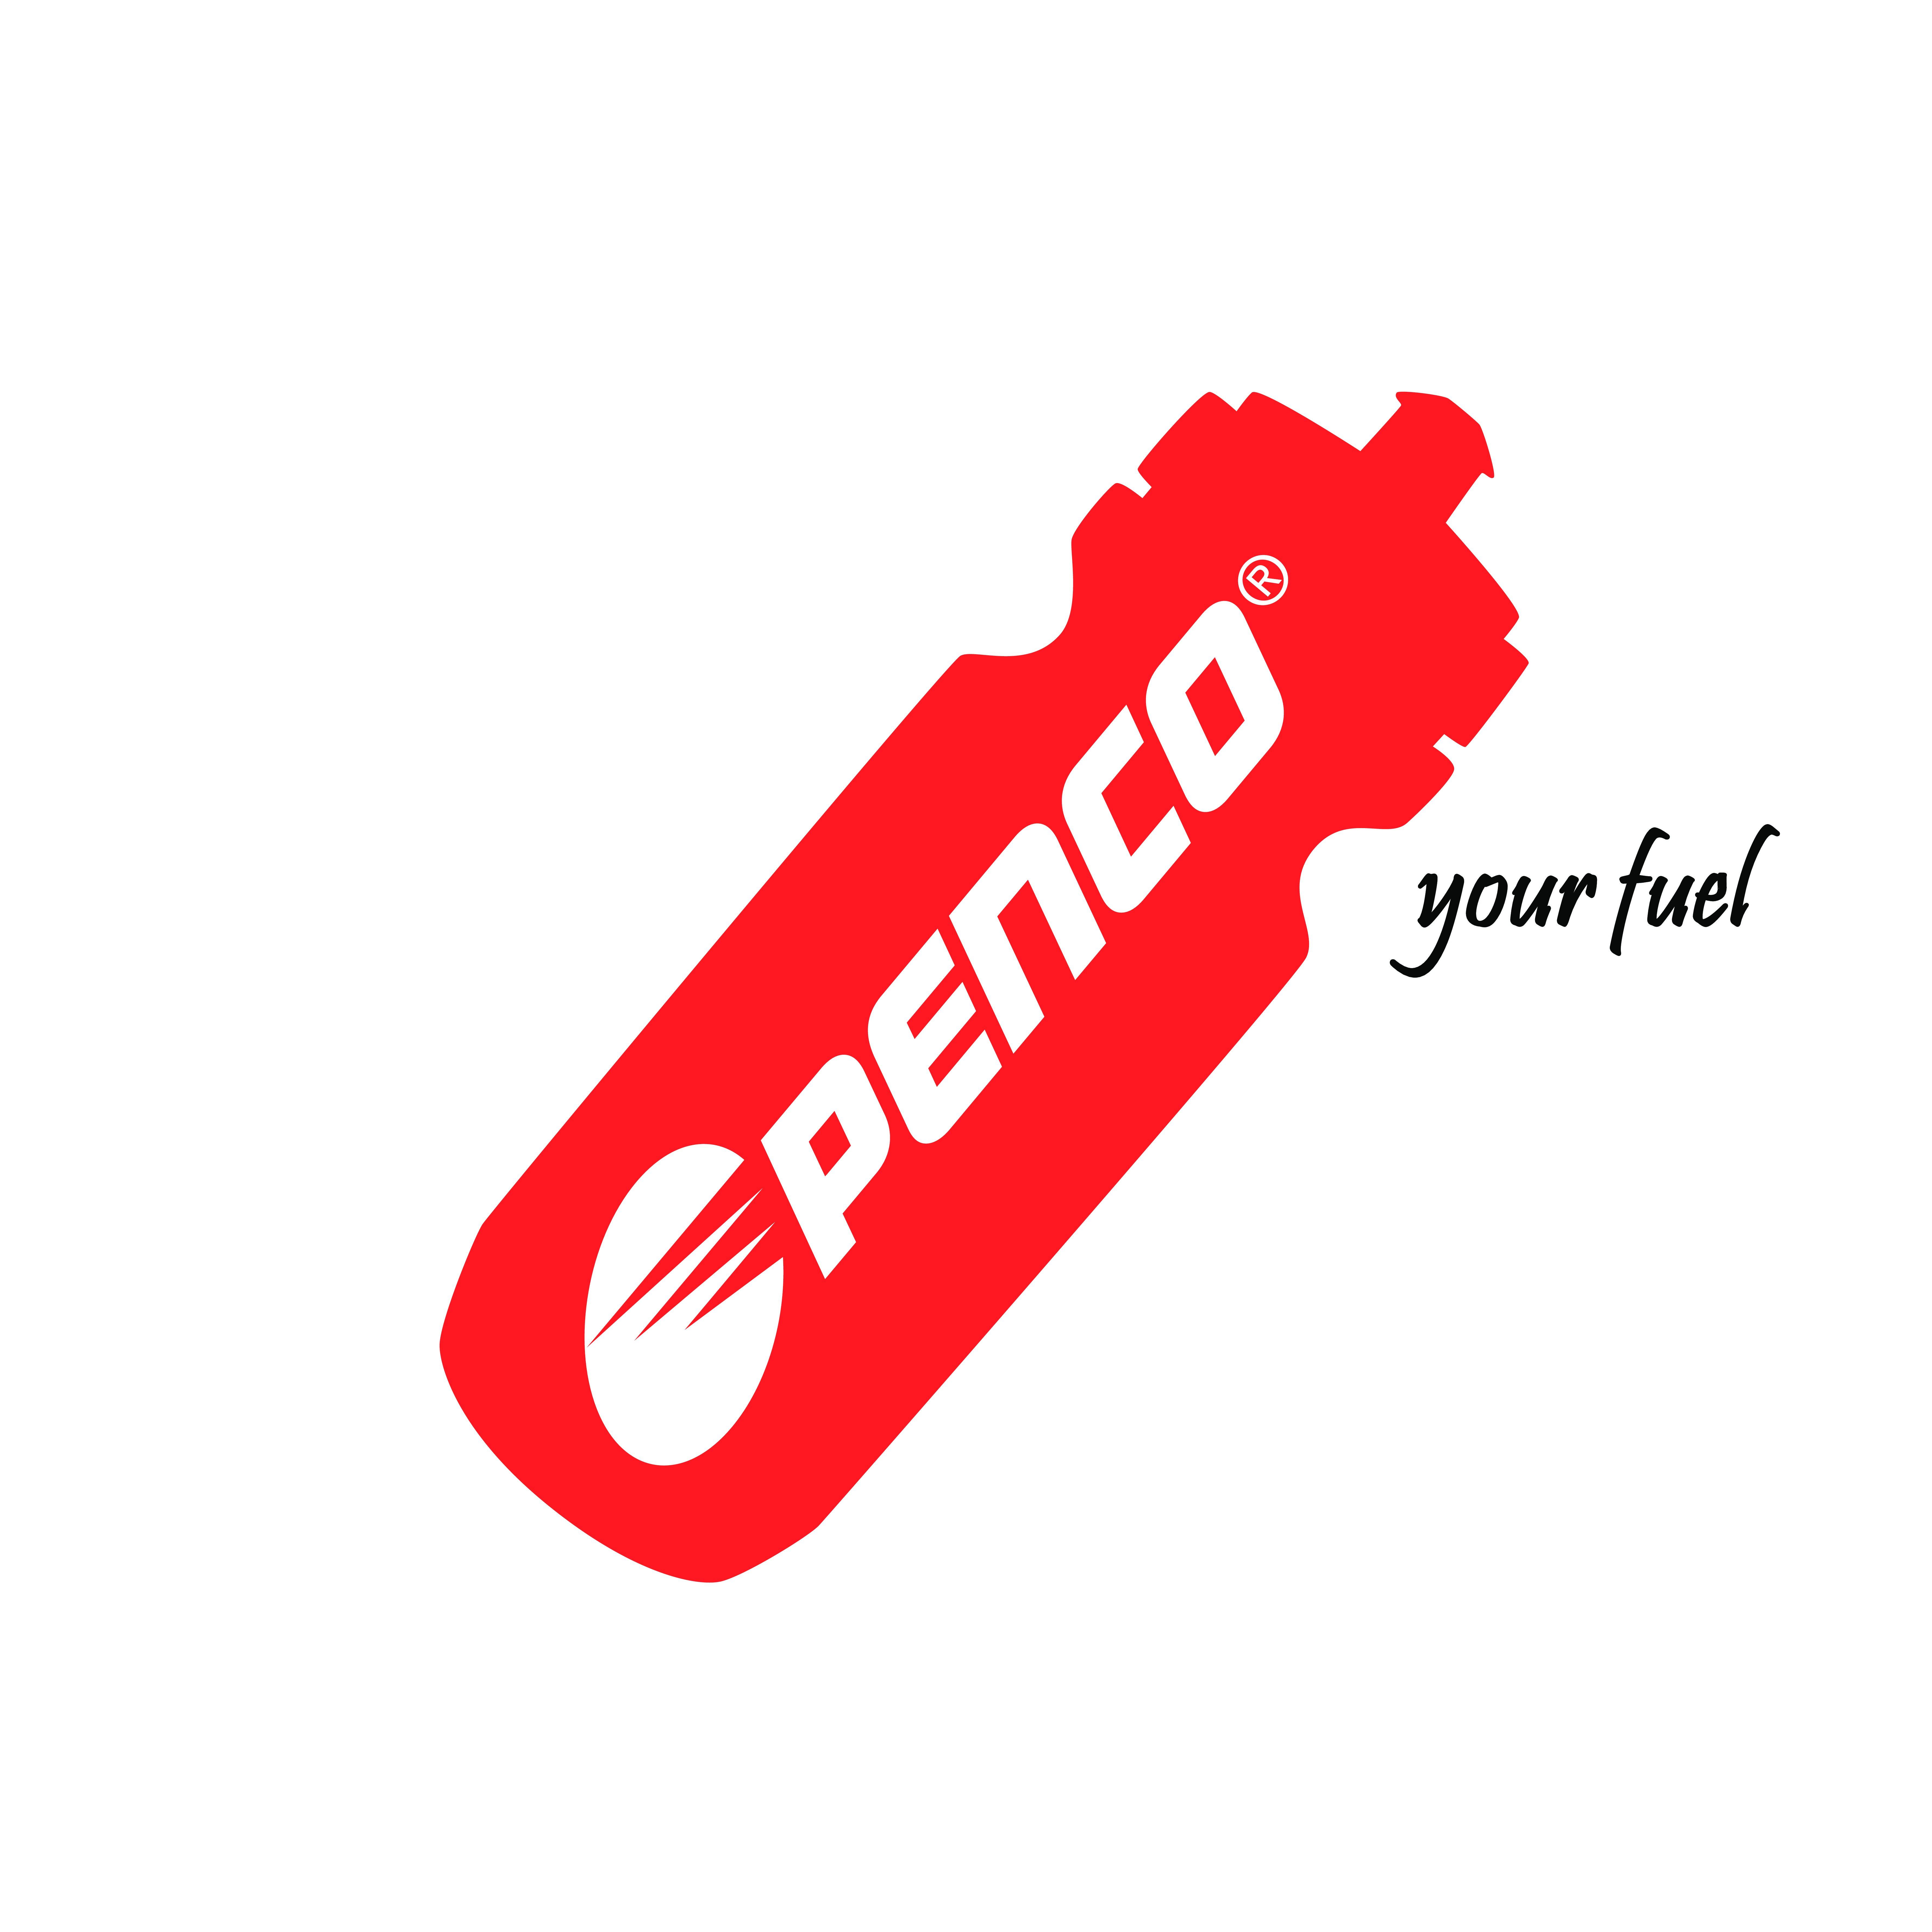 logo PENCO your fuel _2018